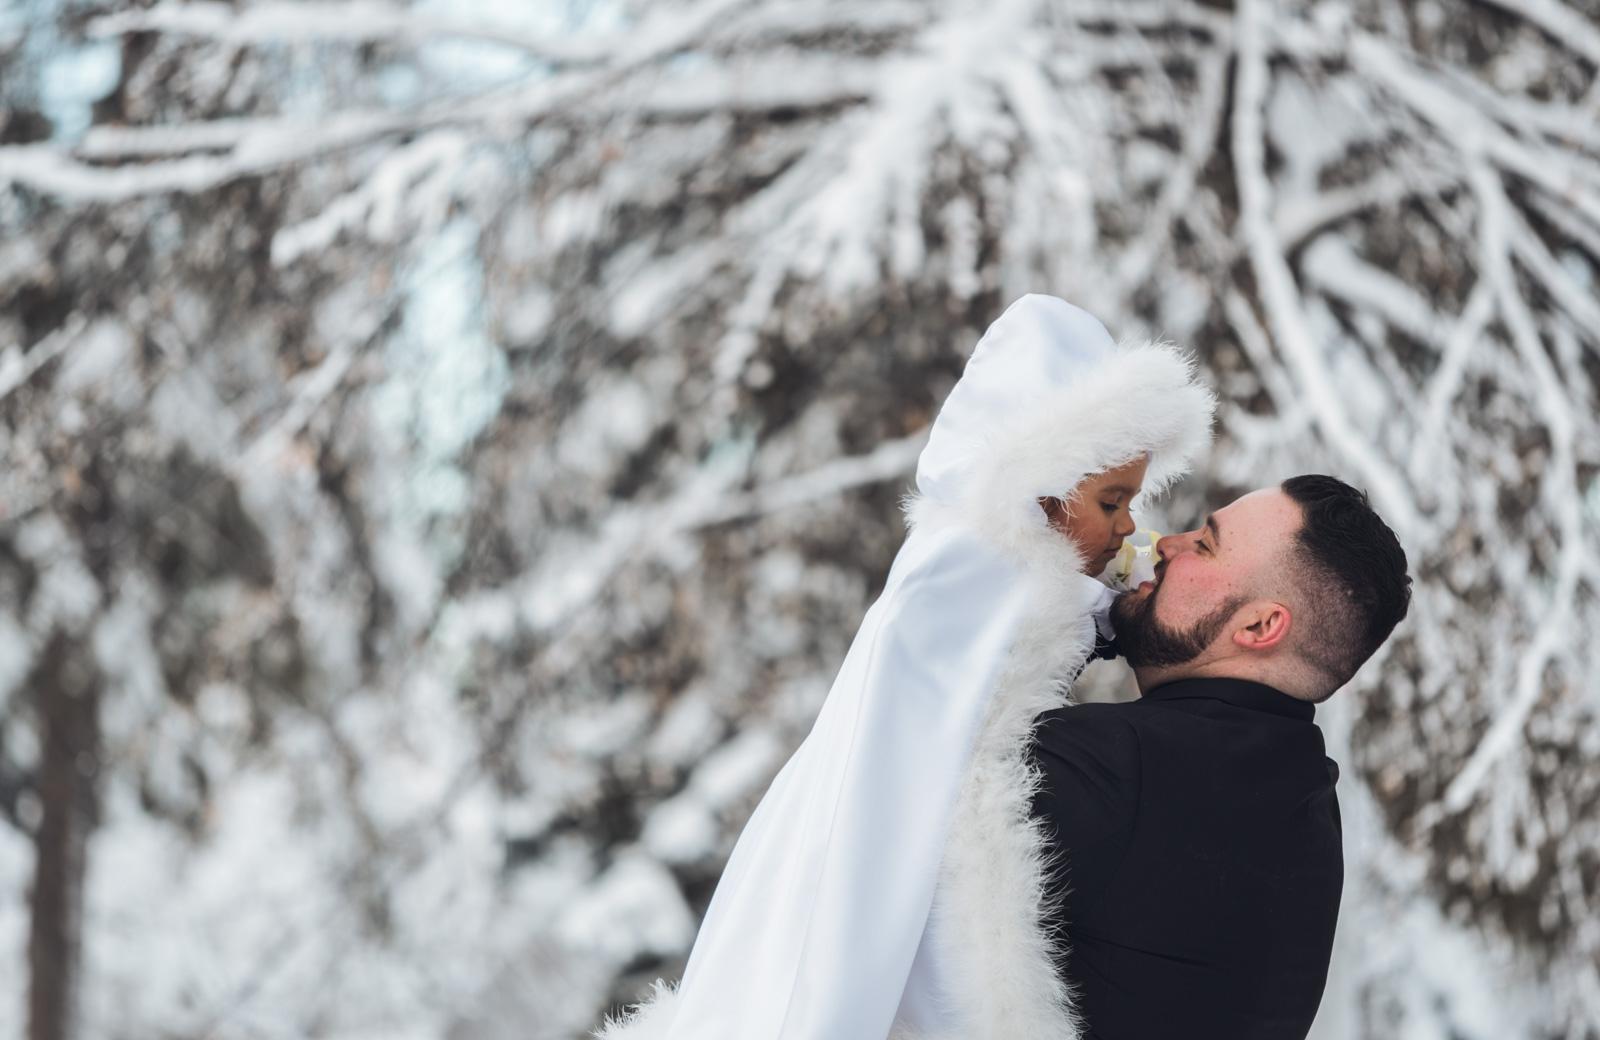 rheana-chris-wedding-blog-163.jpg